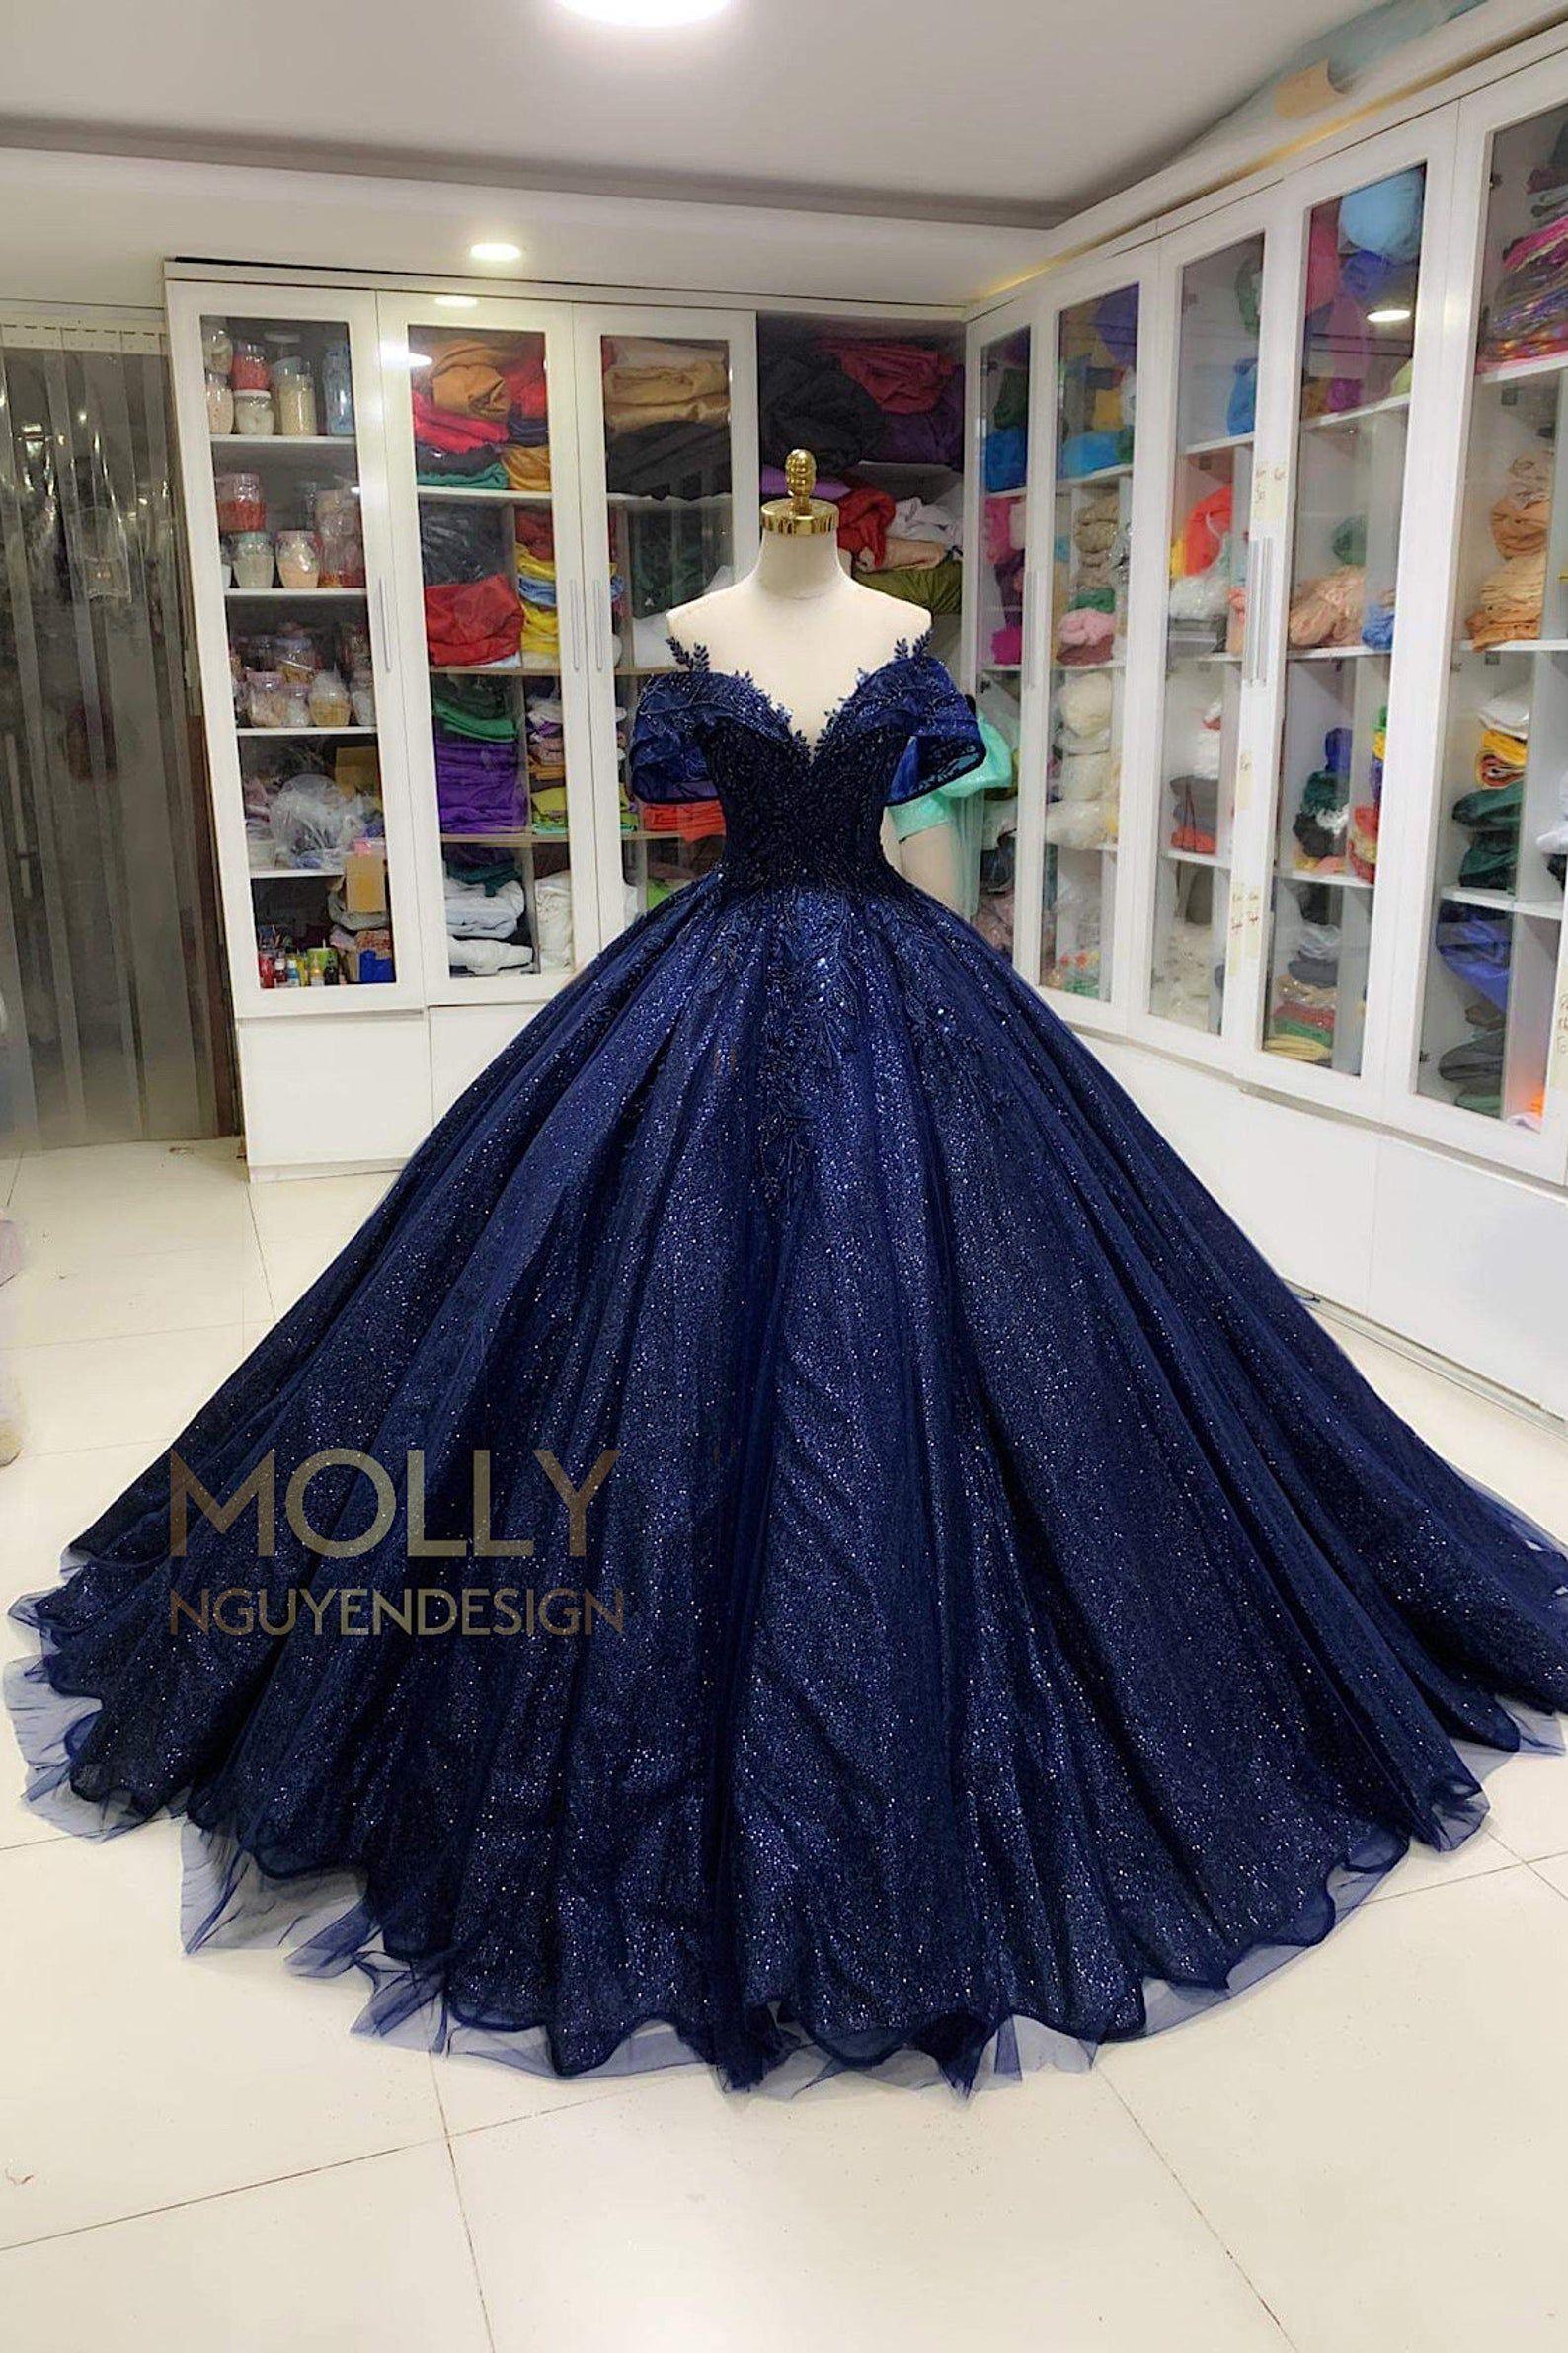 Dark Blue Sparkly Dress Dark Blue Ballgown Quinceanera Dress Blue Off Shoulder Black Blue Dress In 2021 Blue Sparkly Dress Sparkly Dress Quinceanera Dresses Blue [ 2383 x 1588 Pixel ]